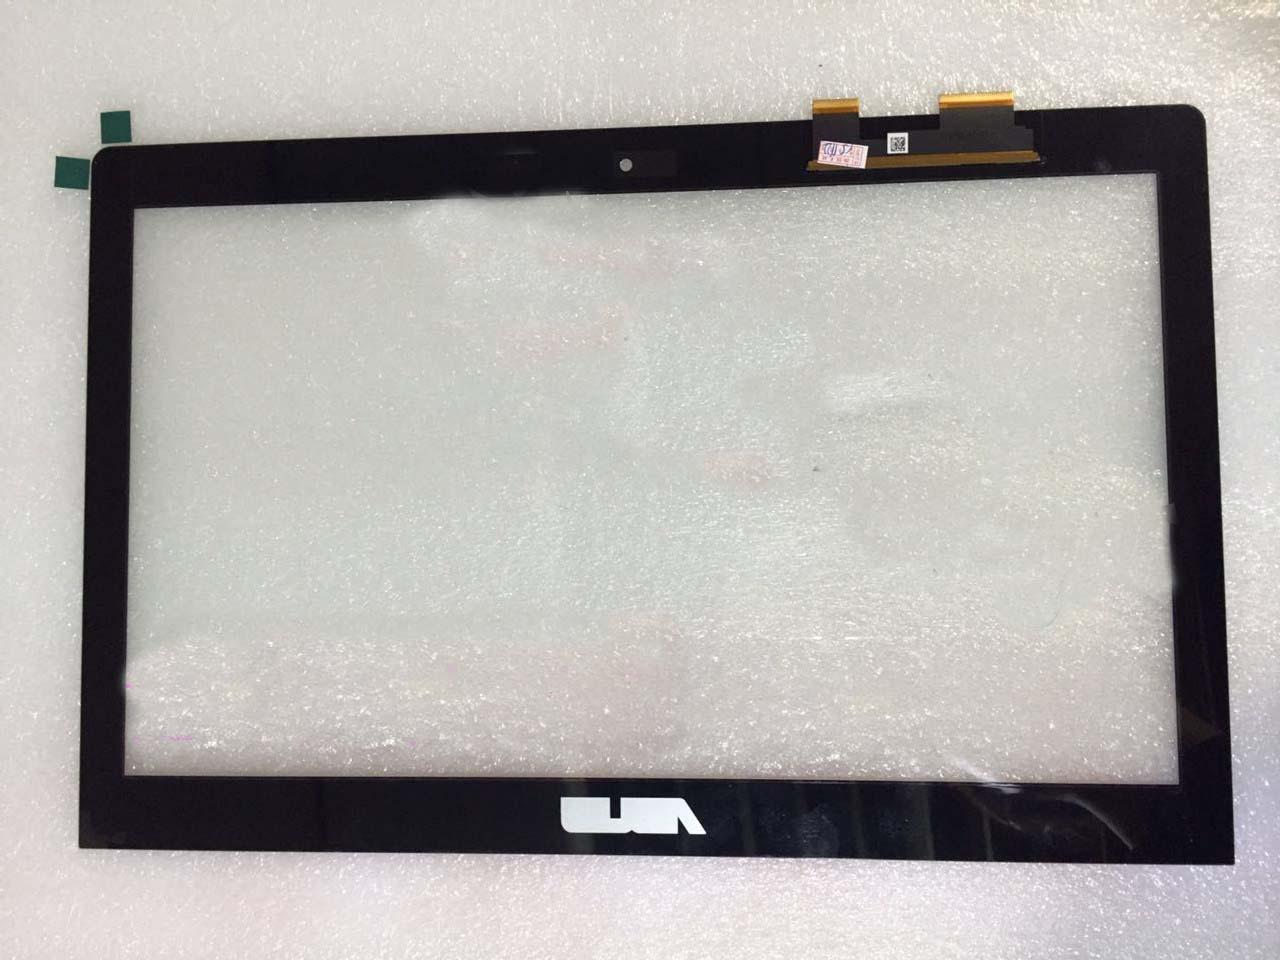 For ASUS VivoBook S400 S400CA Touch Screen Panel Digitizer Glass Lens Sensor TCP14F21 V1.1 version free shipping